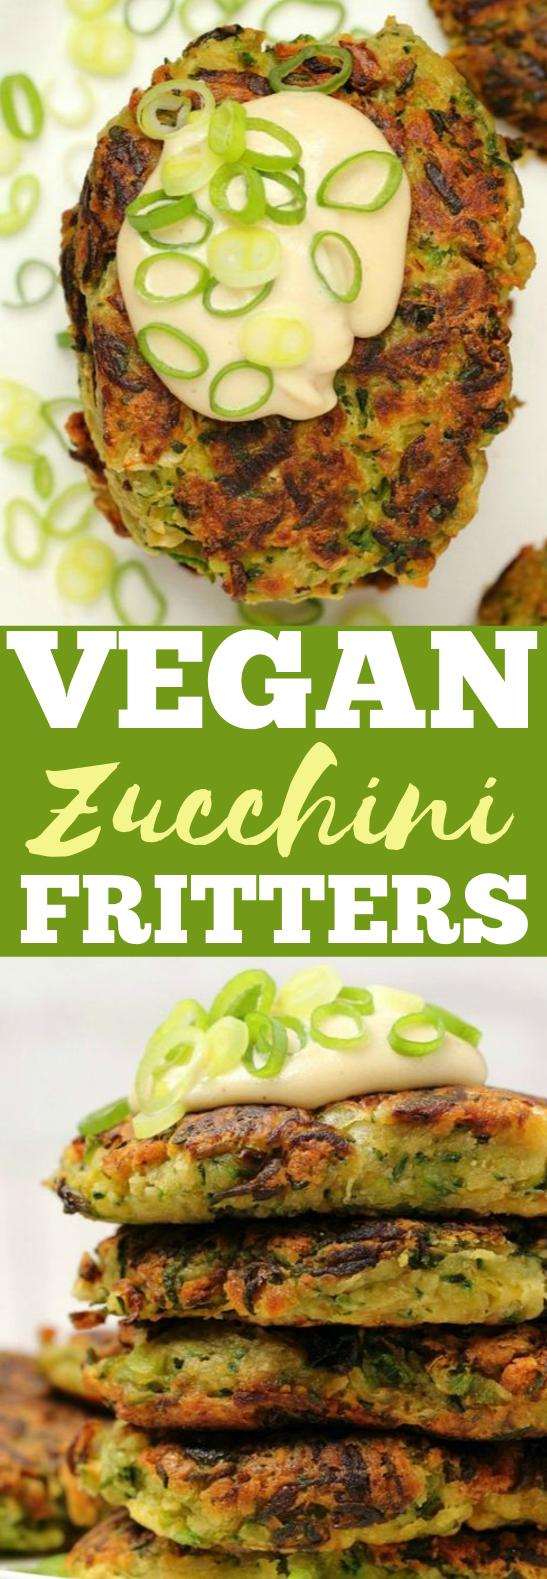 VEGAN ZUCCHINI FRITTERS #vegan #appetizers